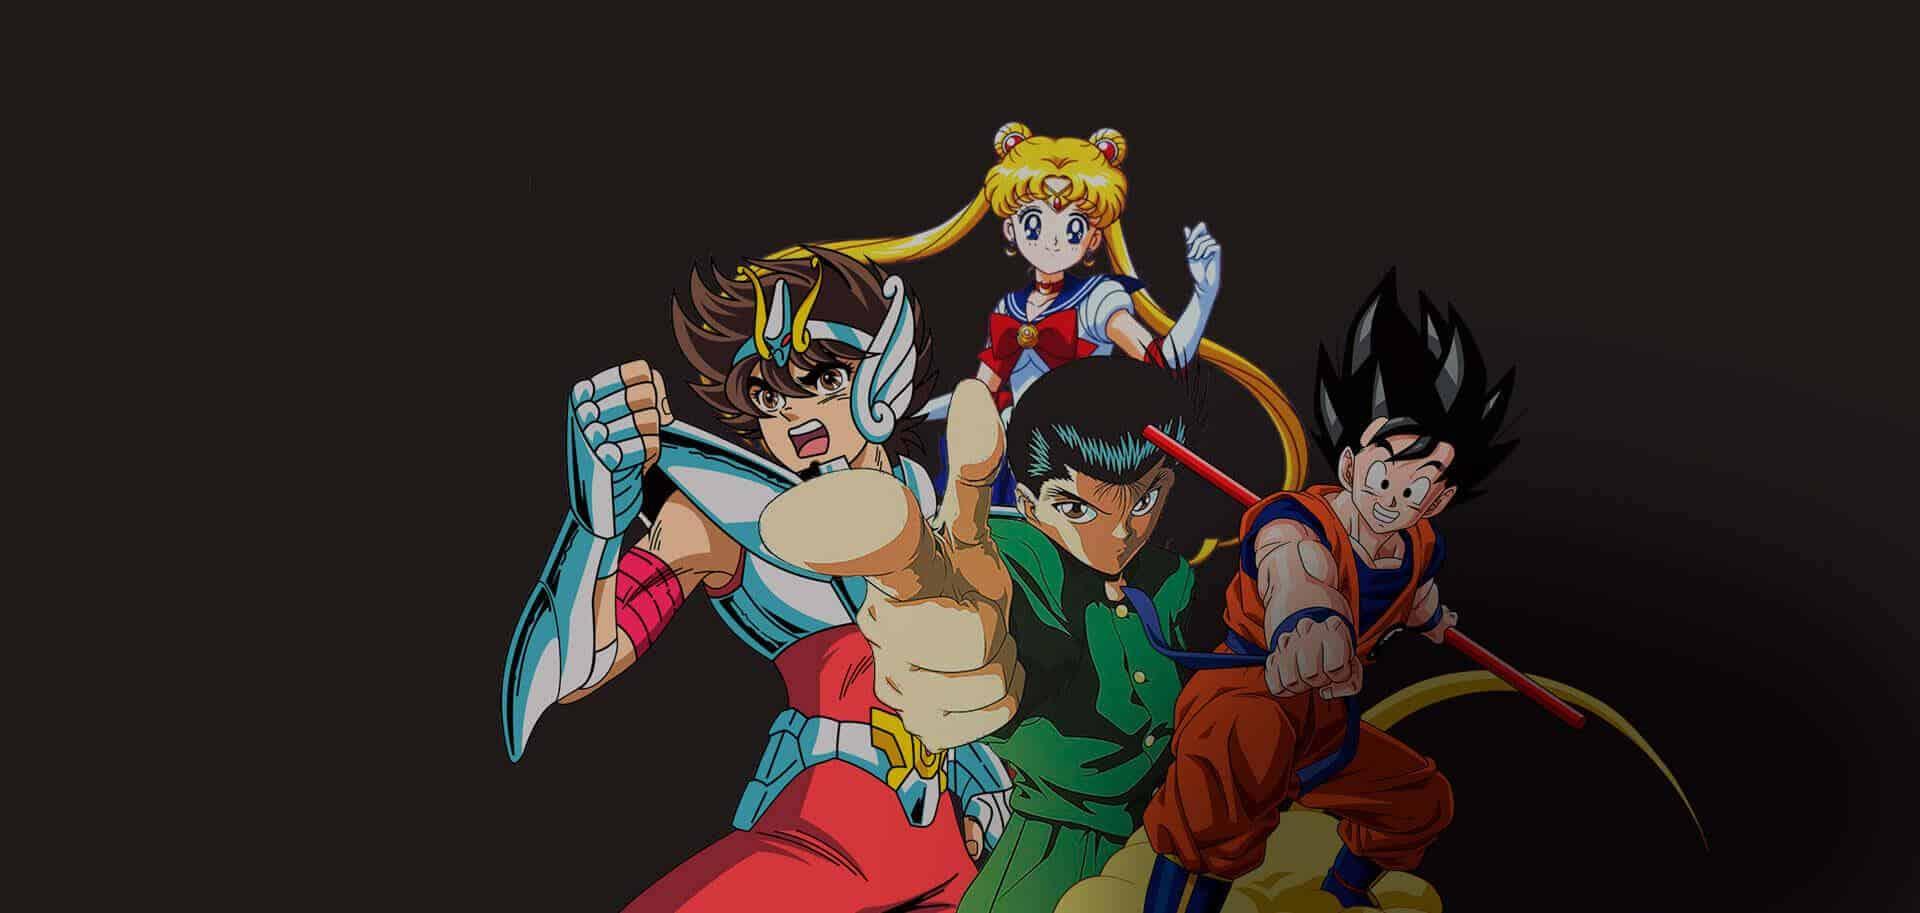 Personagens icônicos dos animes. Seya, Yusuke, Goku...